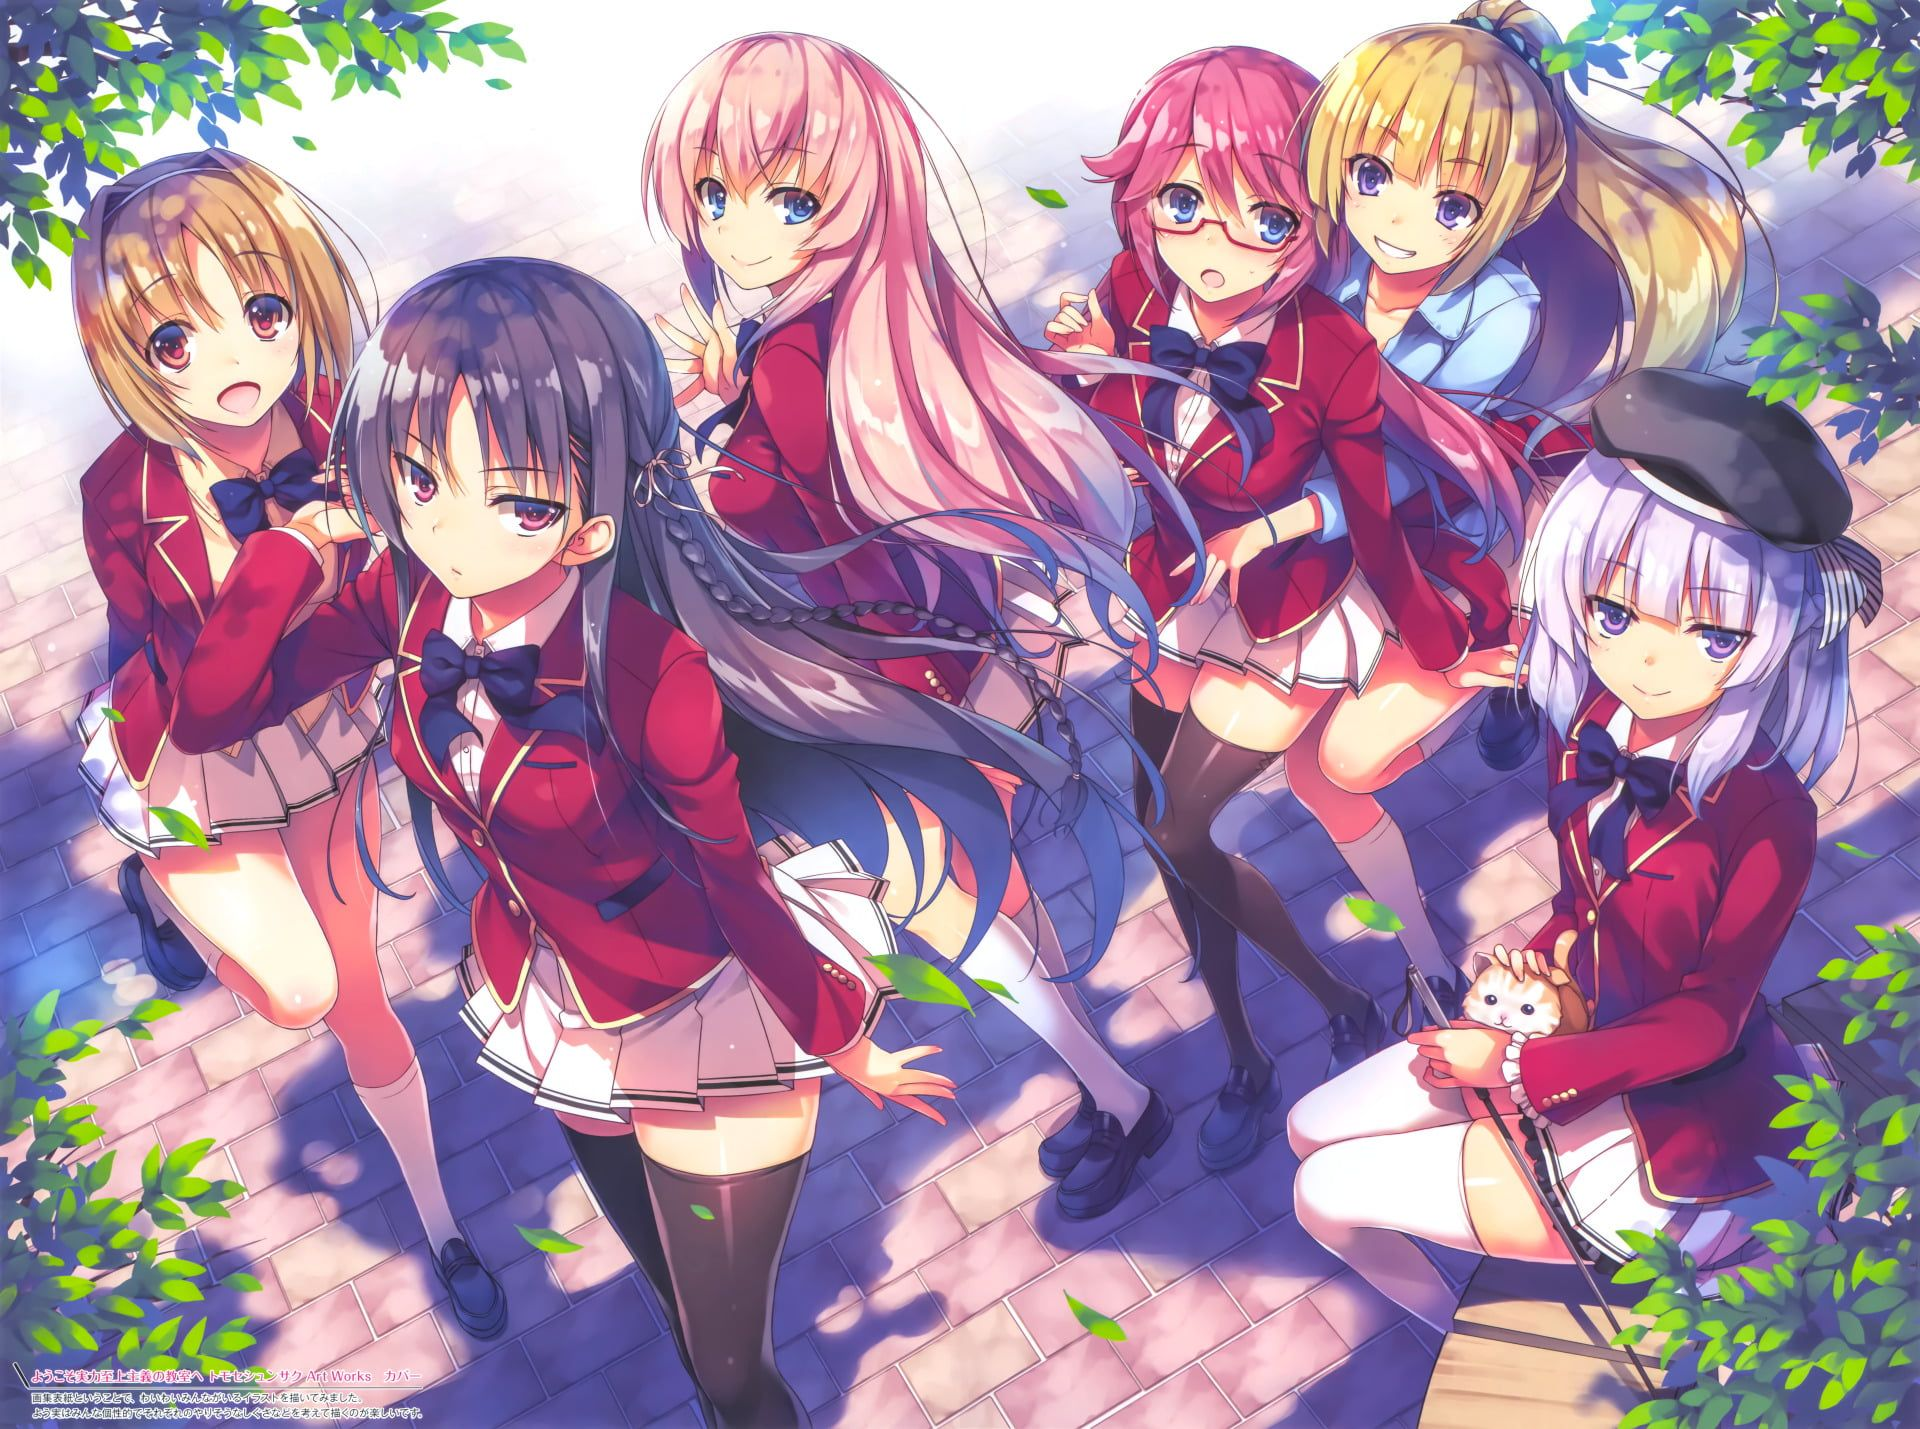 Six Girl Students Anime Characters Wallpaper Anime Classroom Of